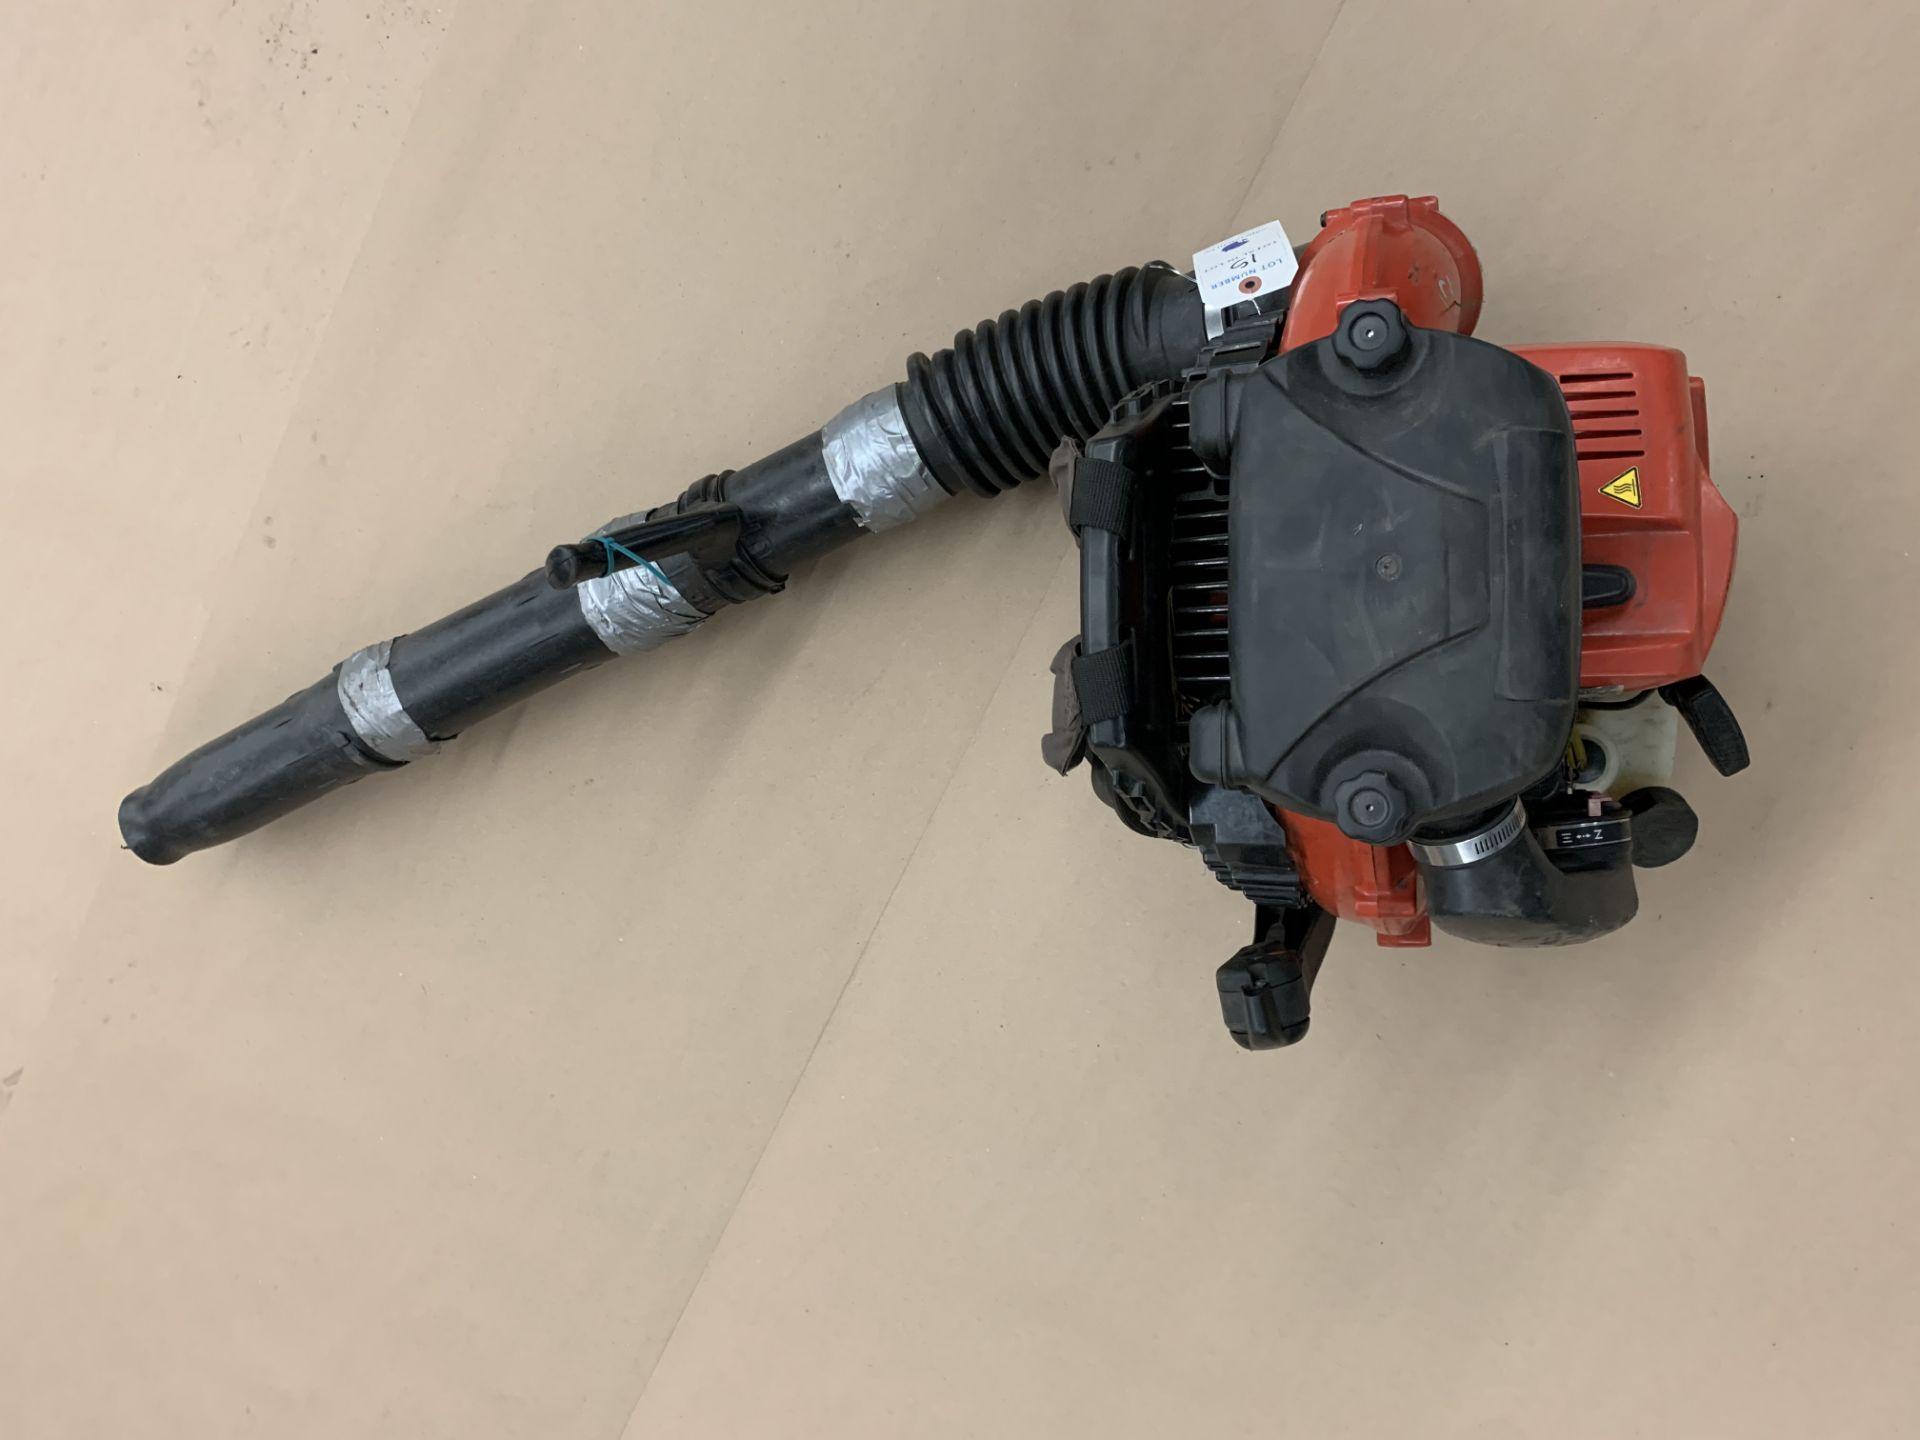 Redmax EBZ8500 Back Pack Blower